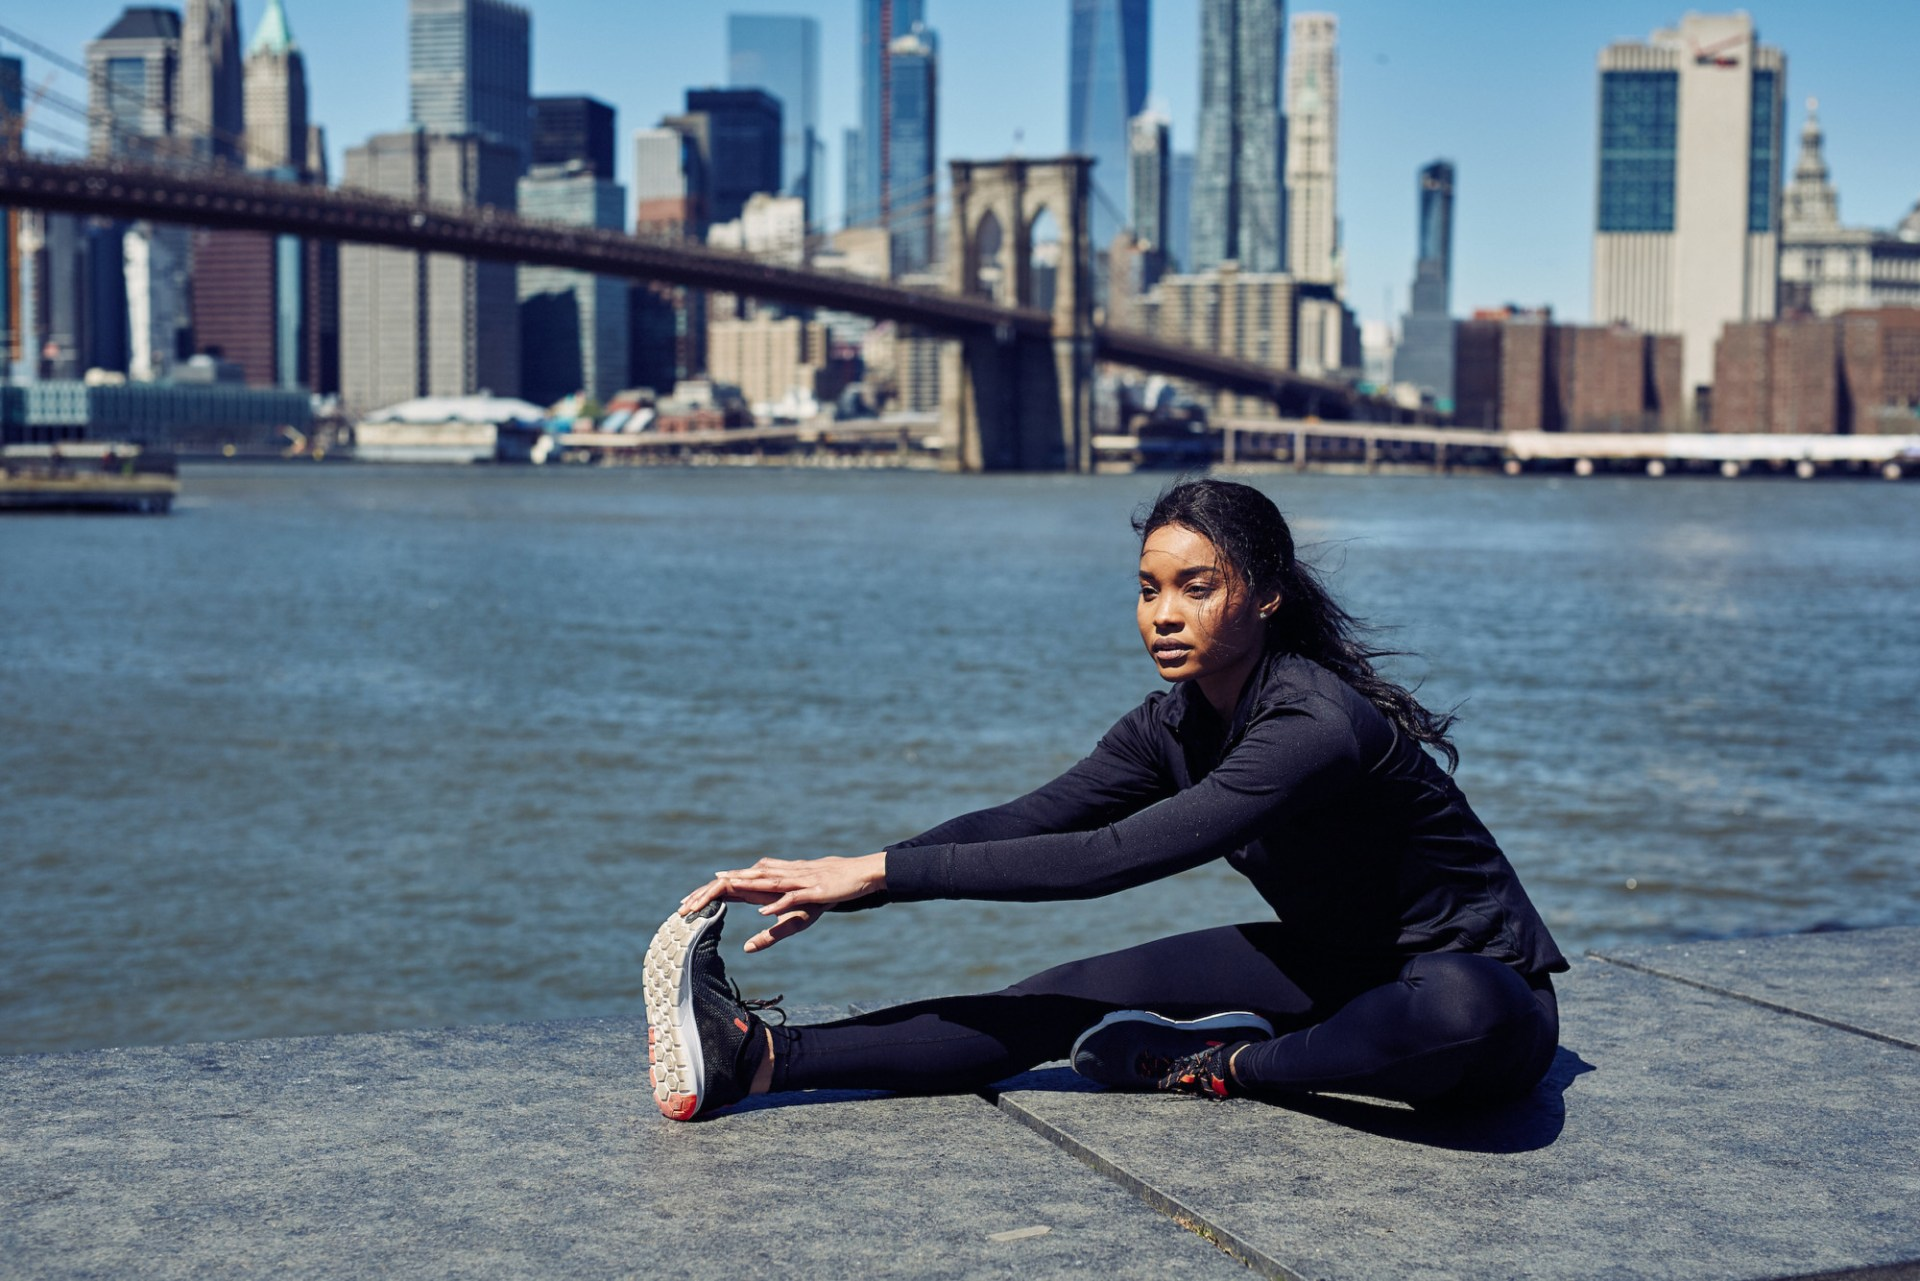 New York City's Healthiest Neighborhoods